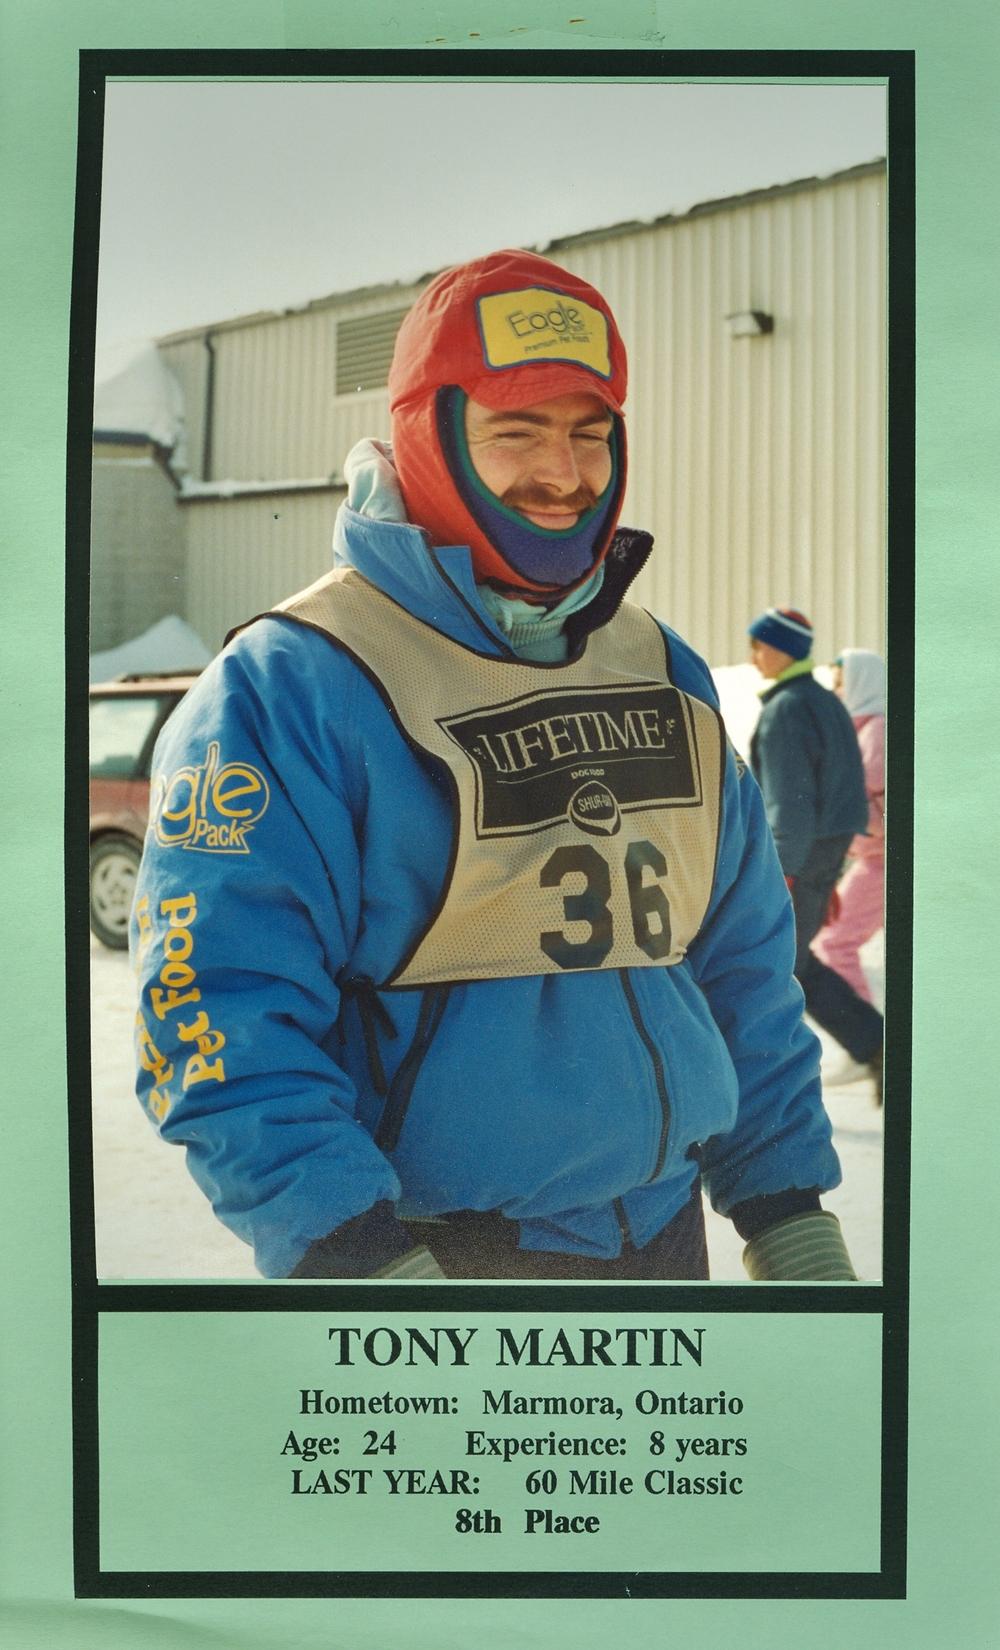 Snofest 1994 Tony Martin, Marmora, Ontario.jpg